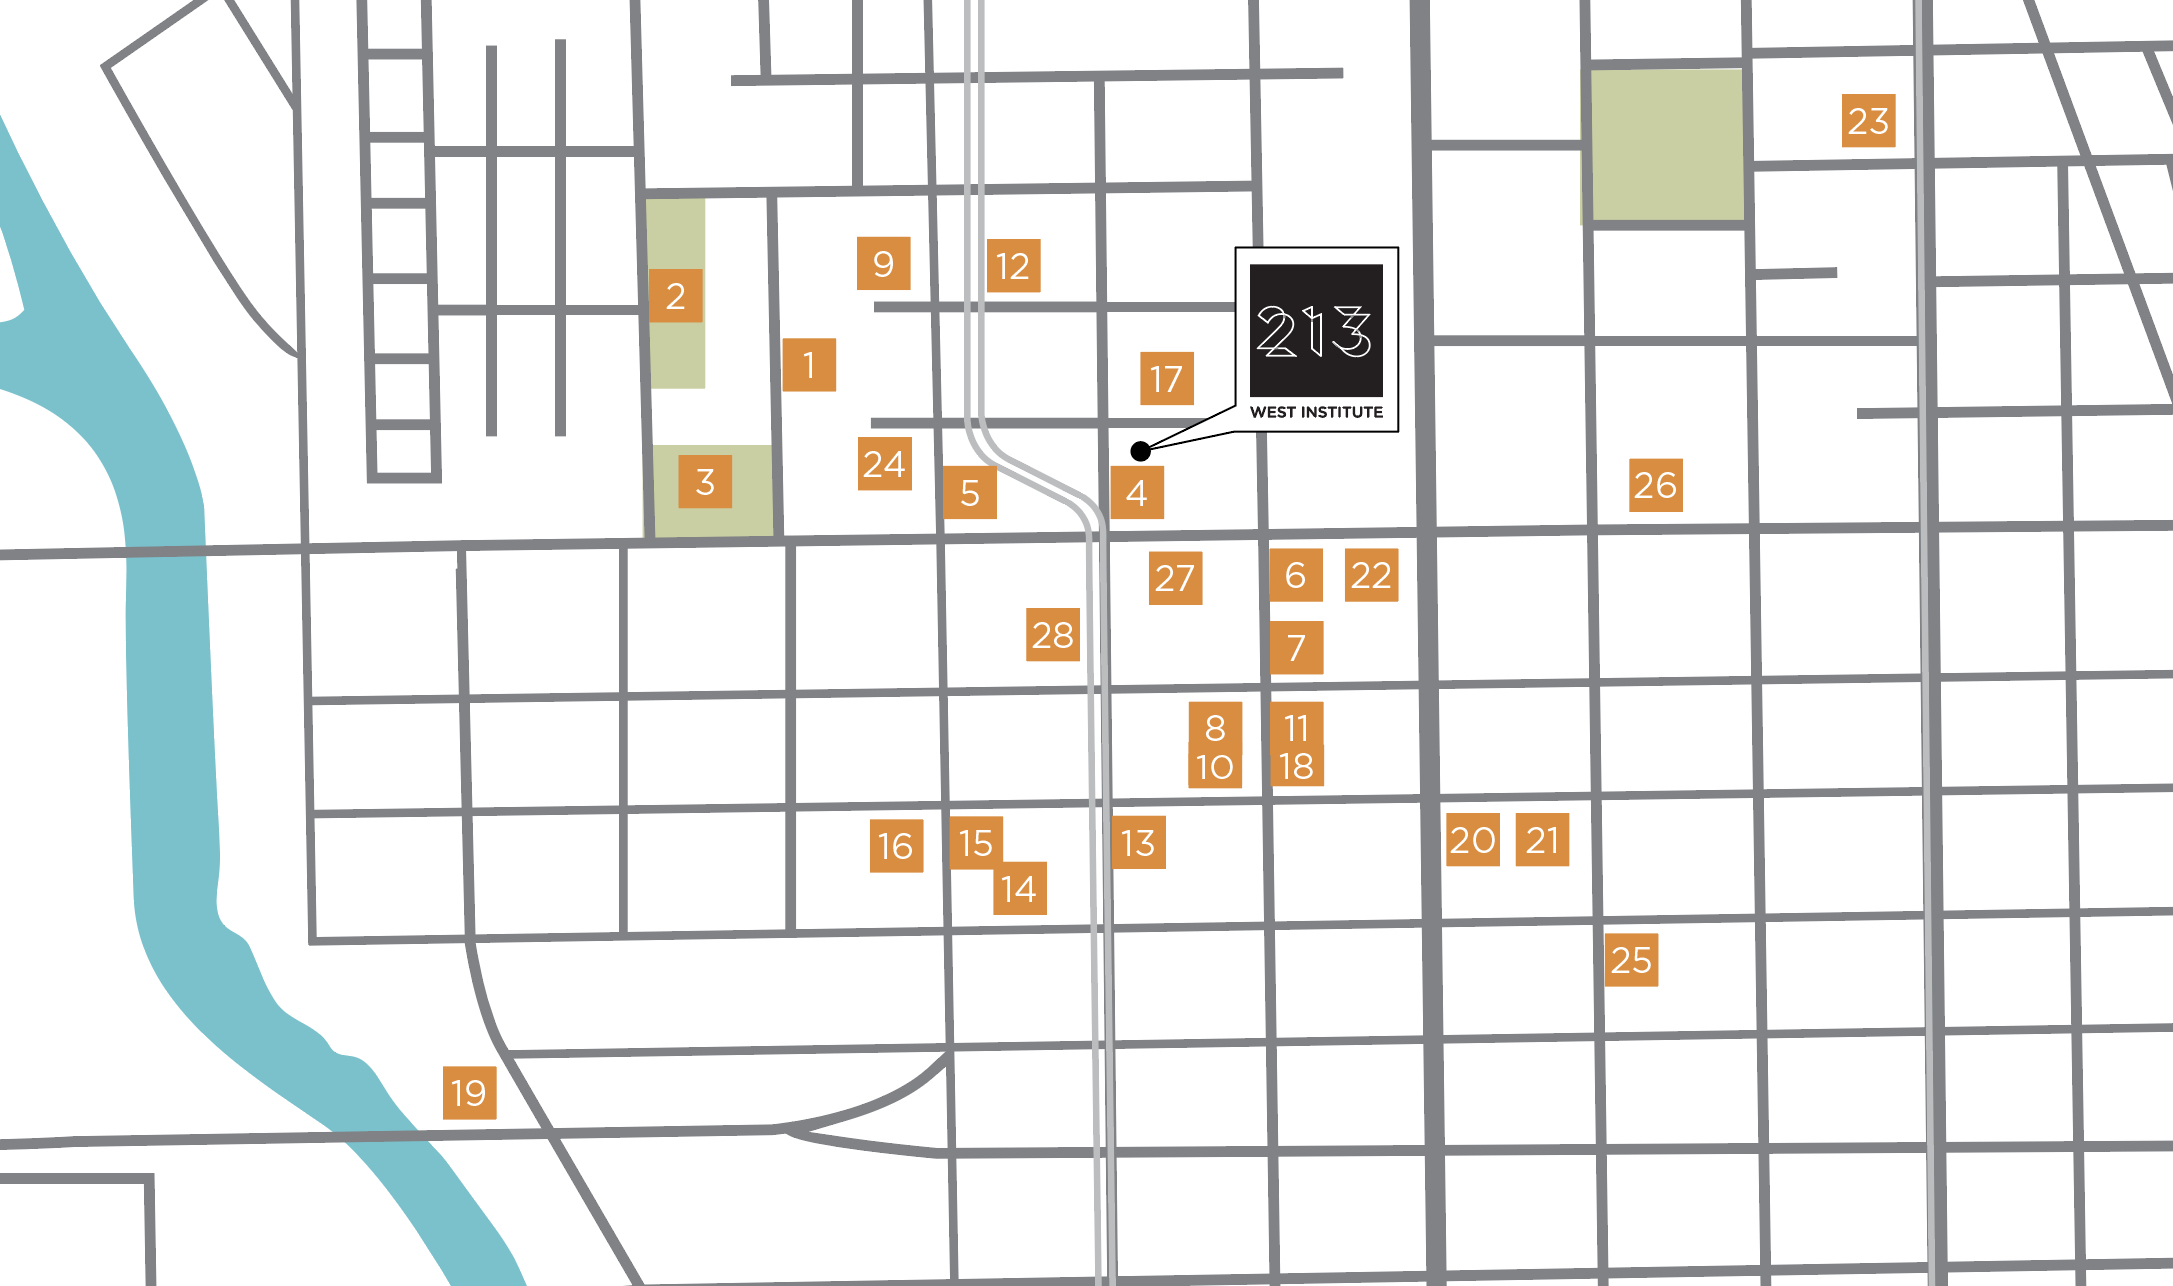 Amenity_Map.jpg